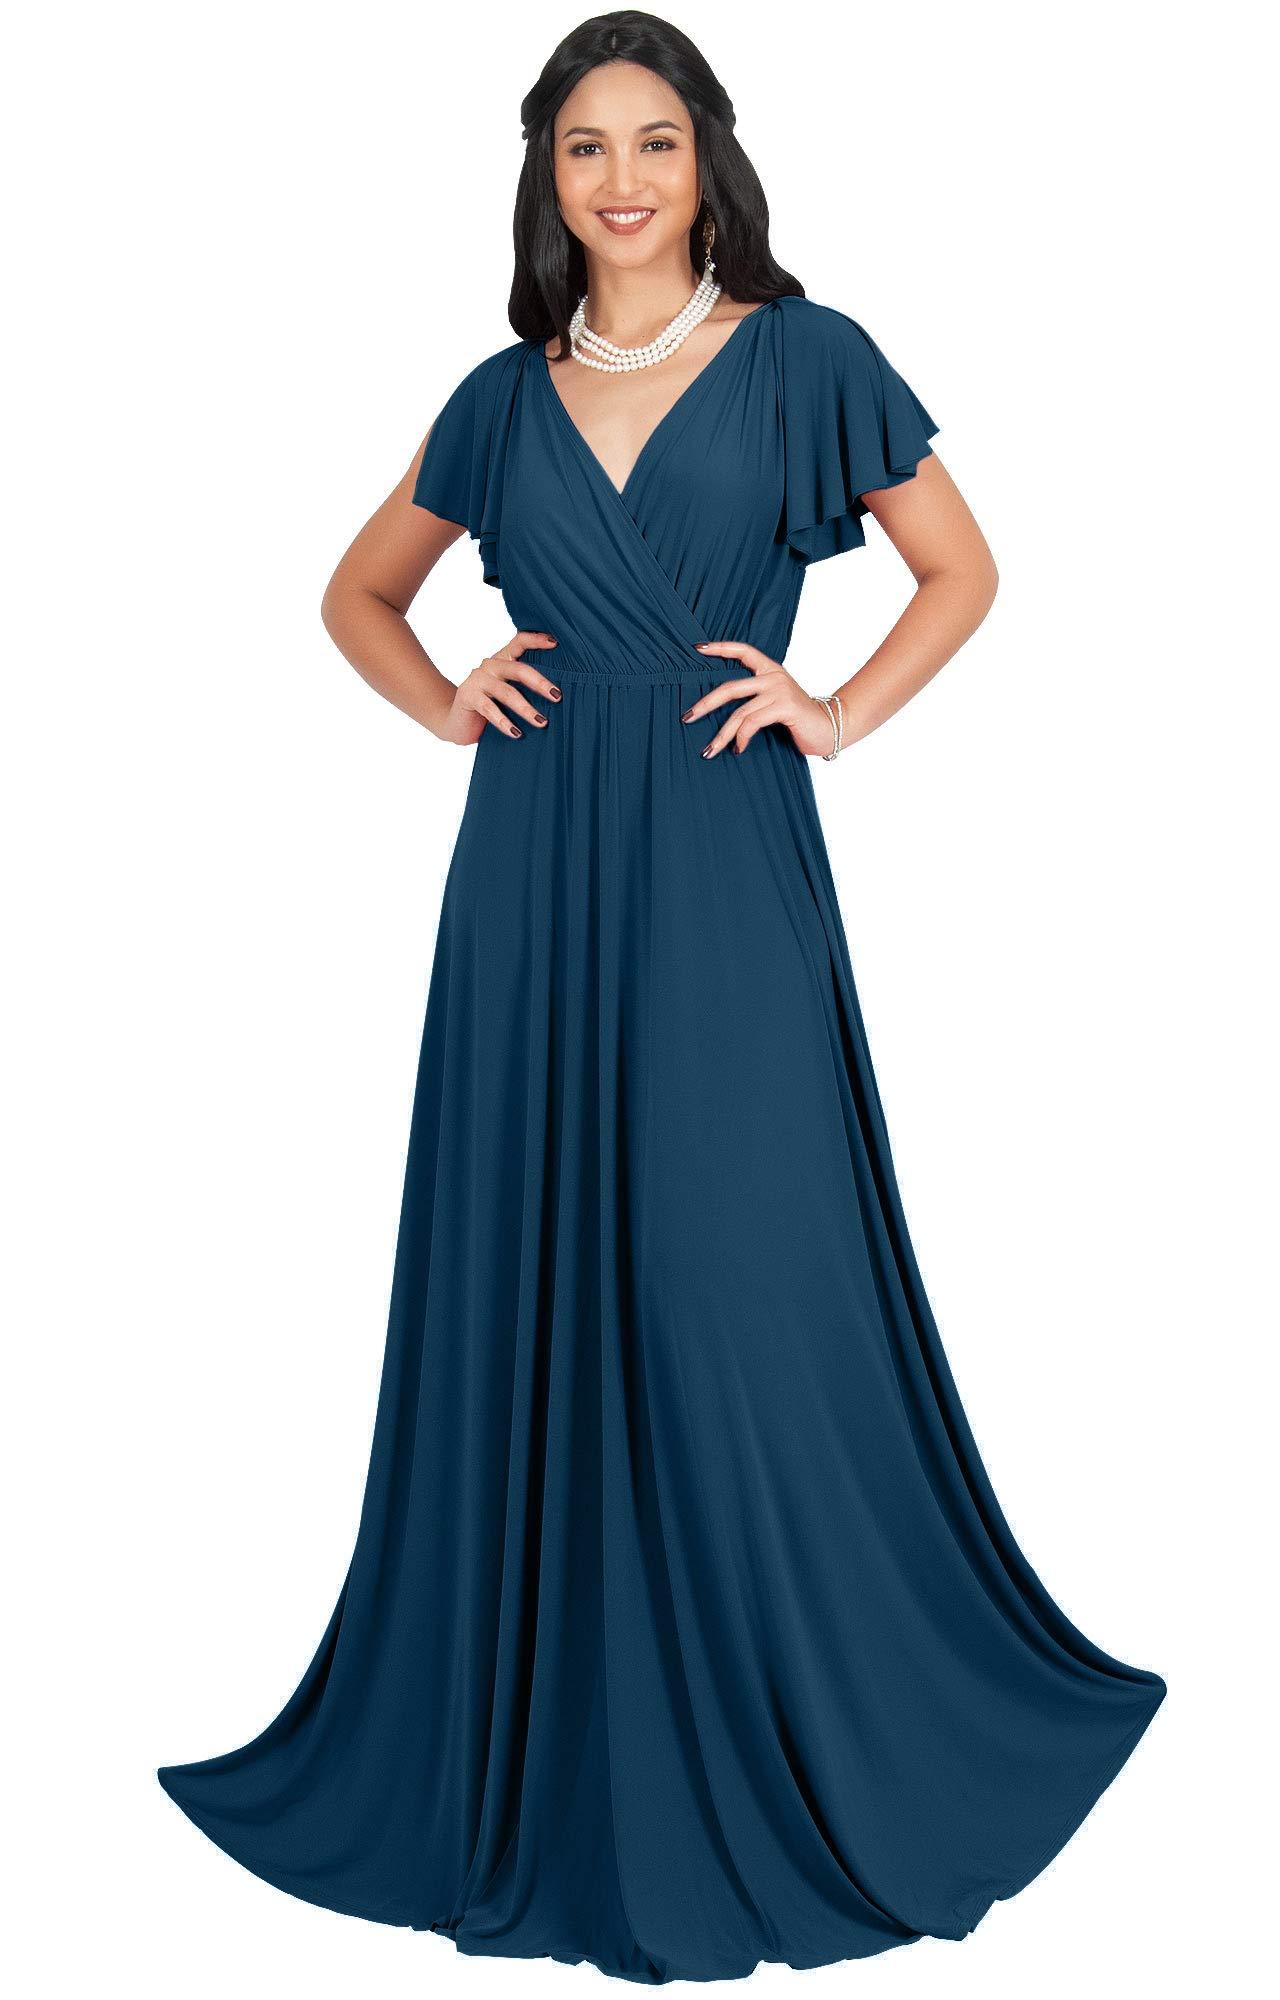 Womens Long Wrap V-Neck Flowy Sleeveless Flowy Evening Bridesmaid Maxi Dress